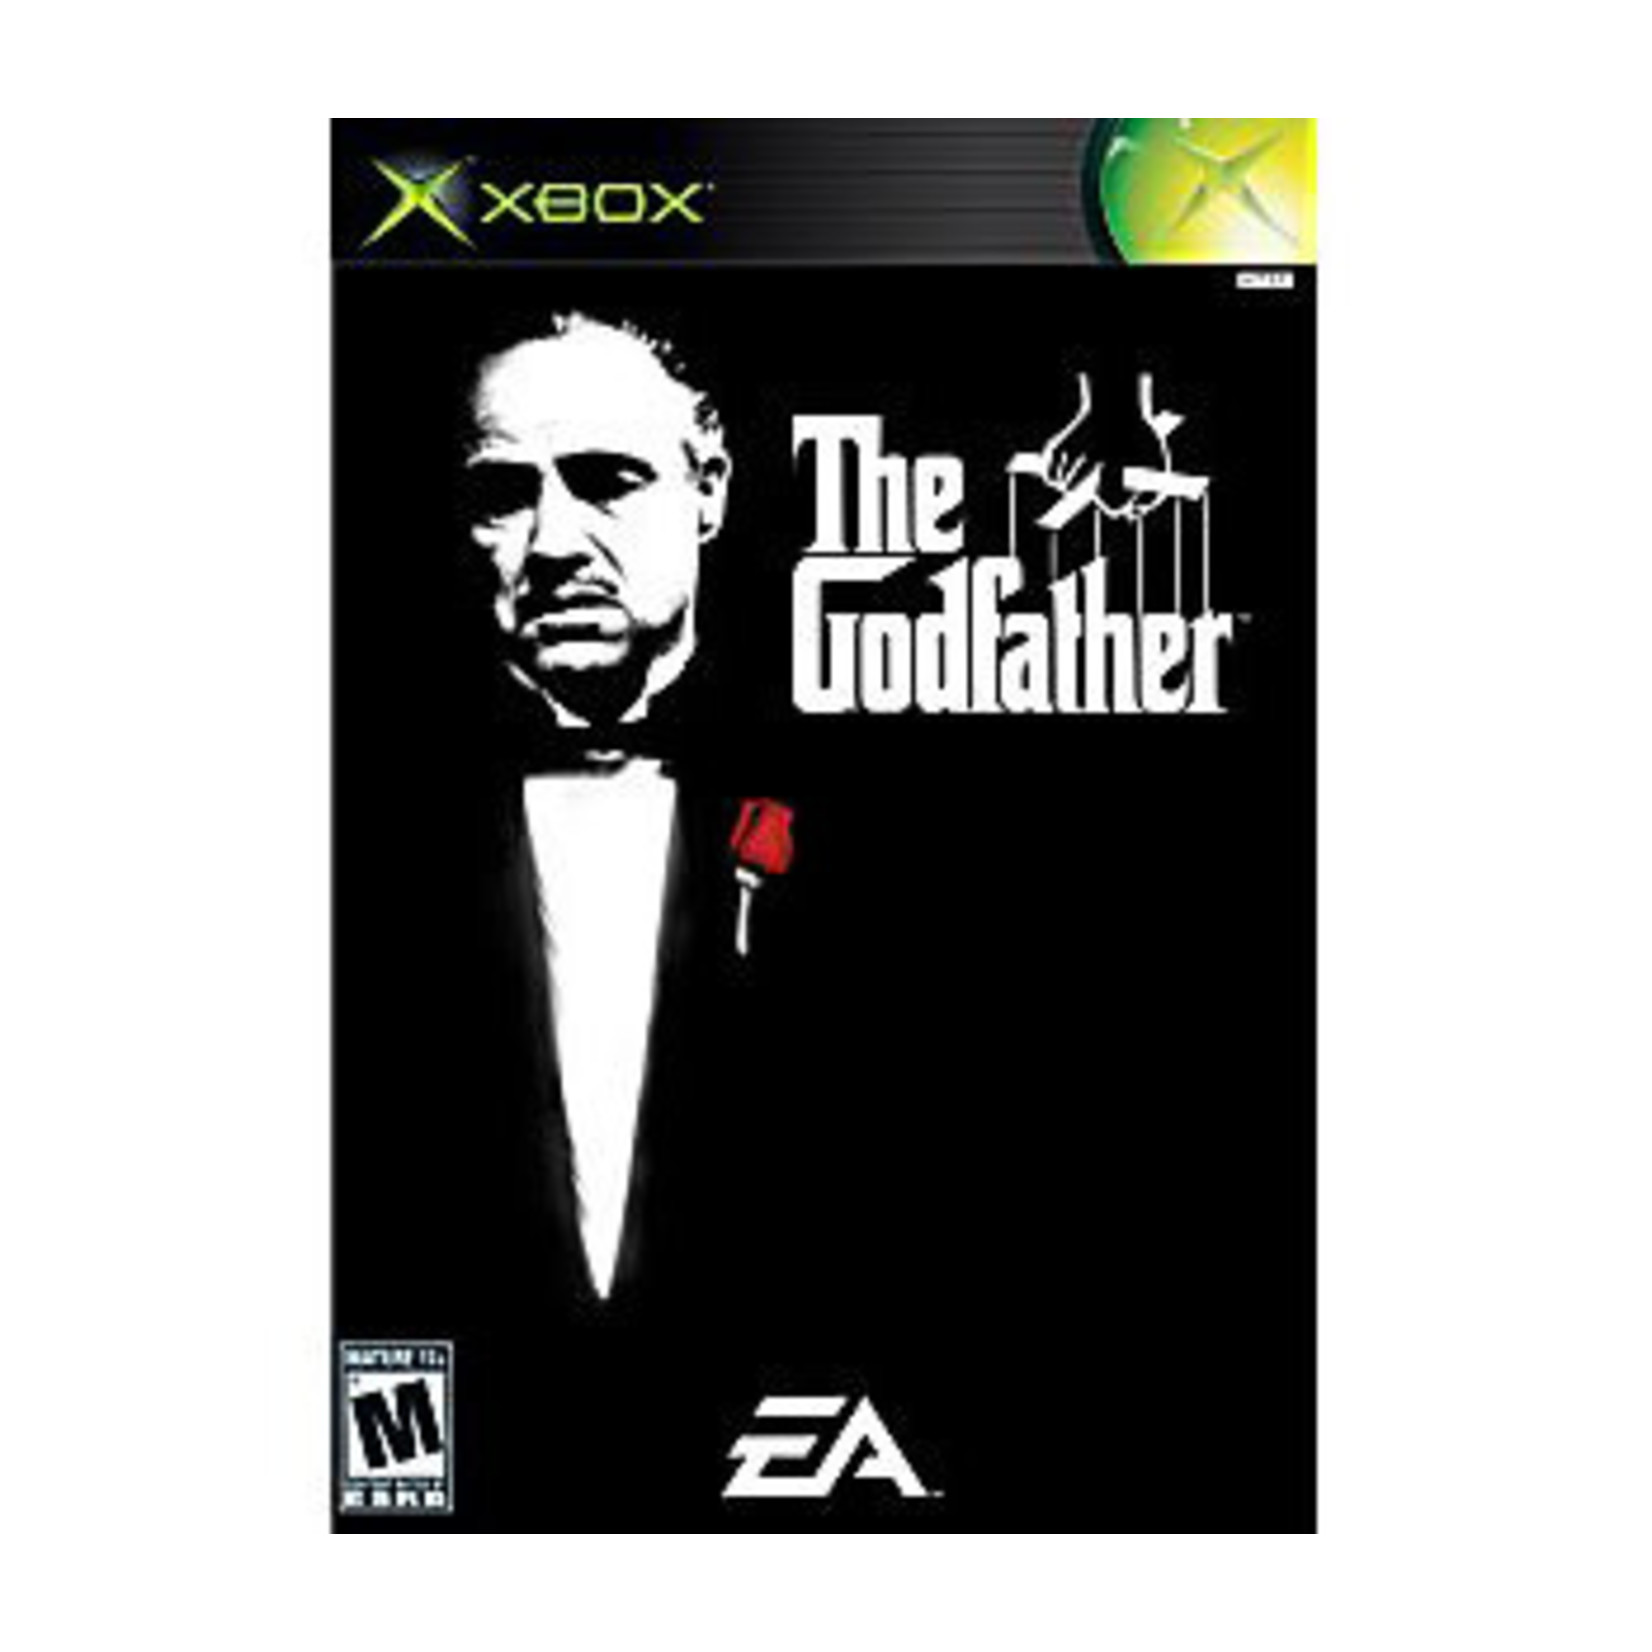 xbu-The Godfather the Game